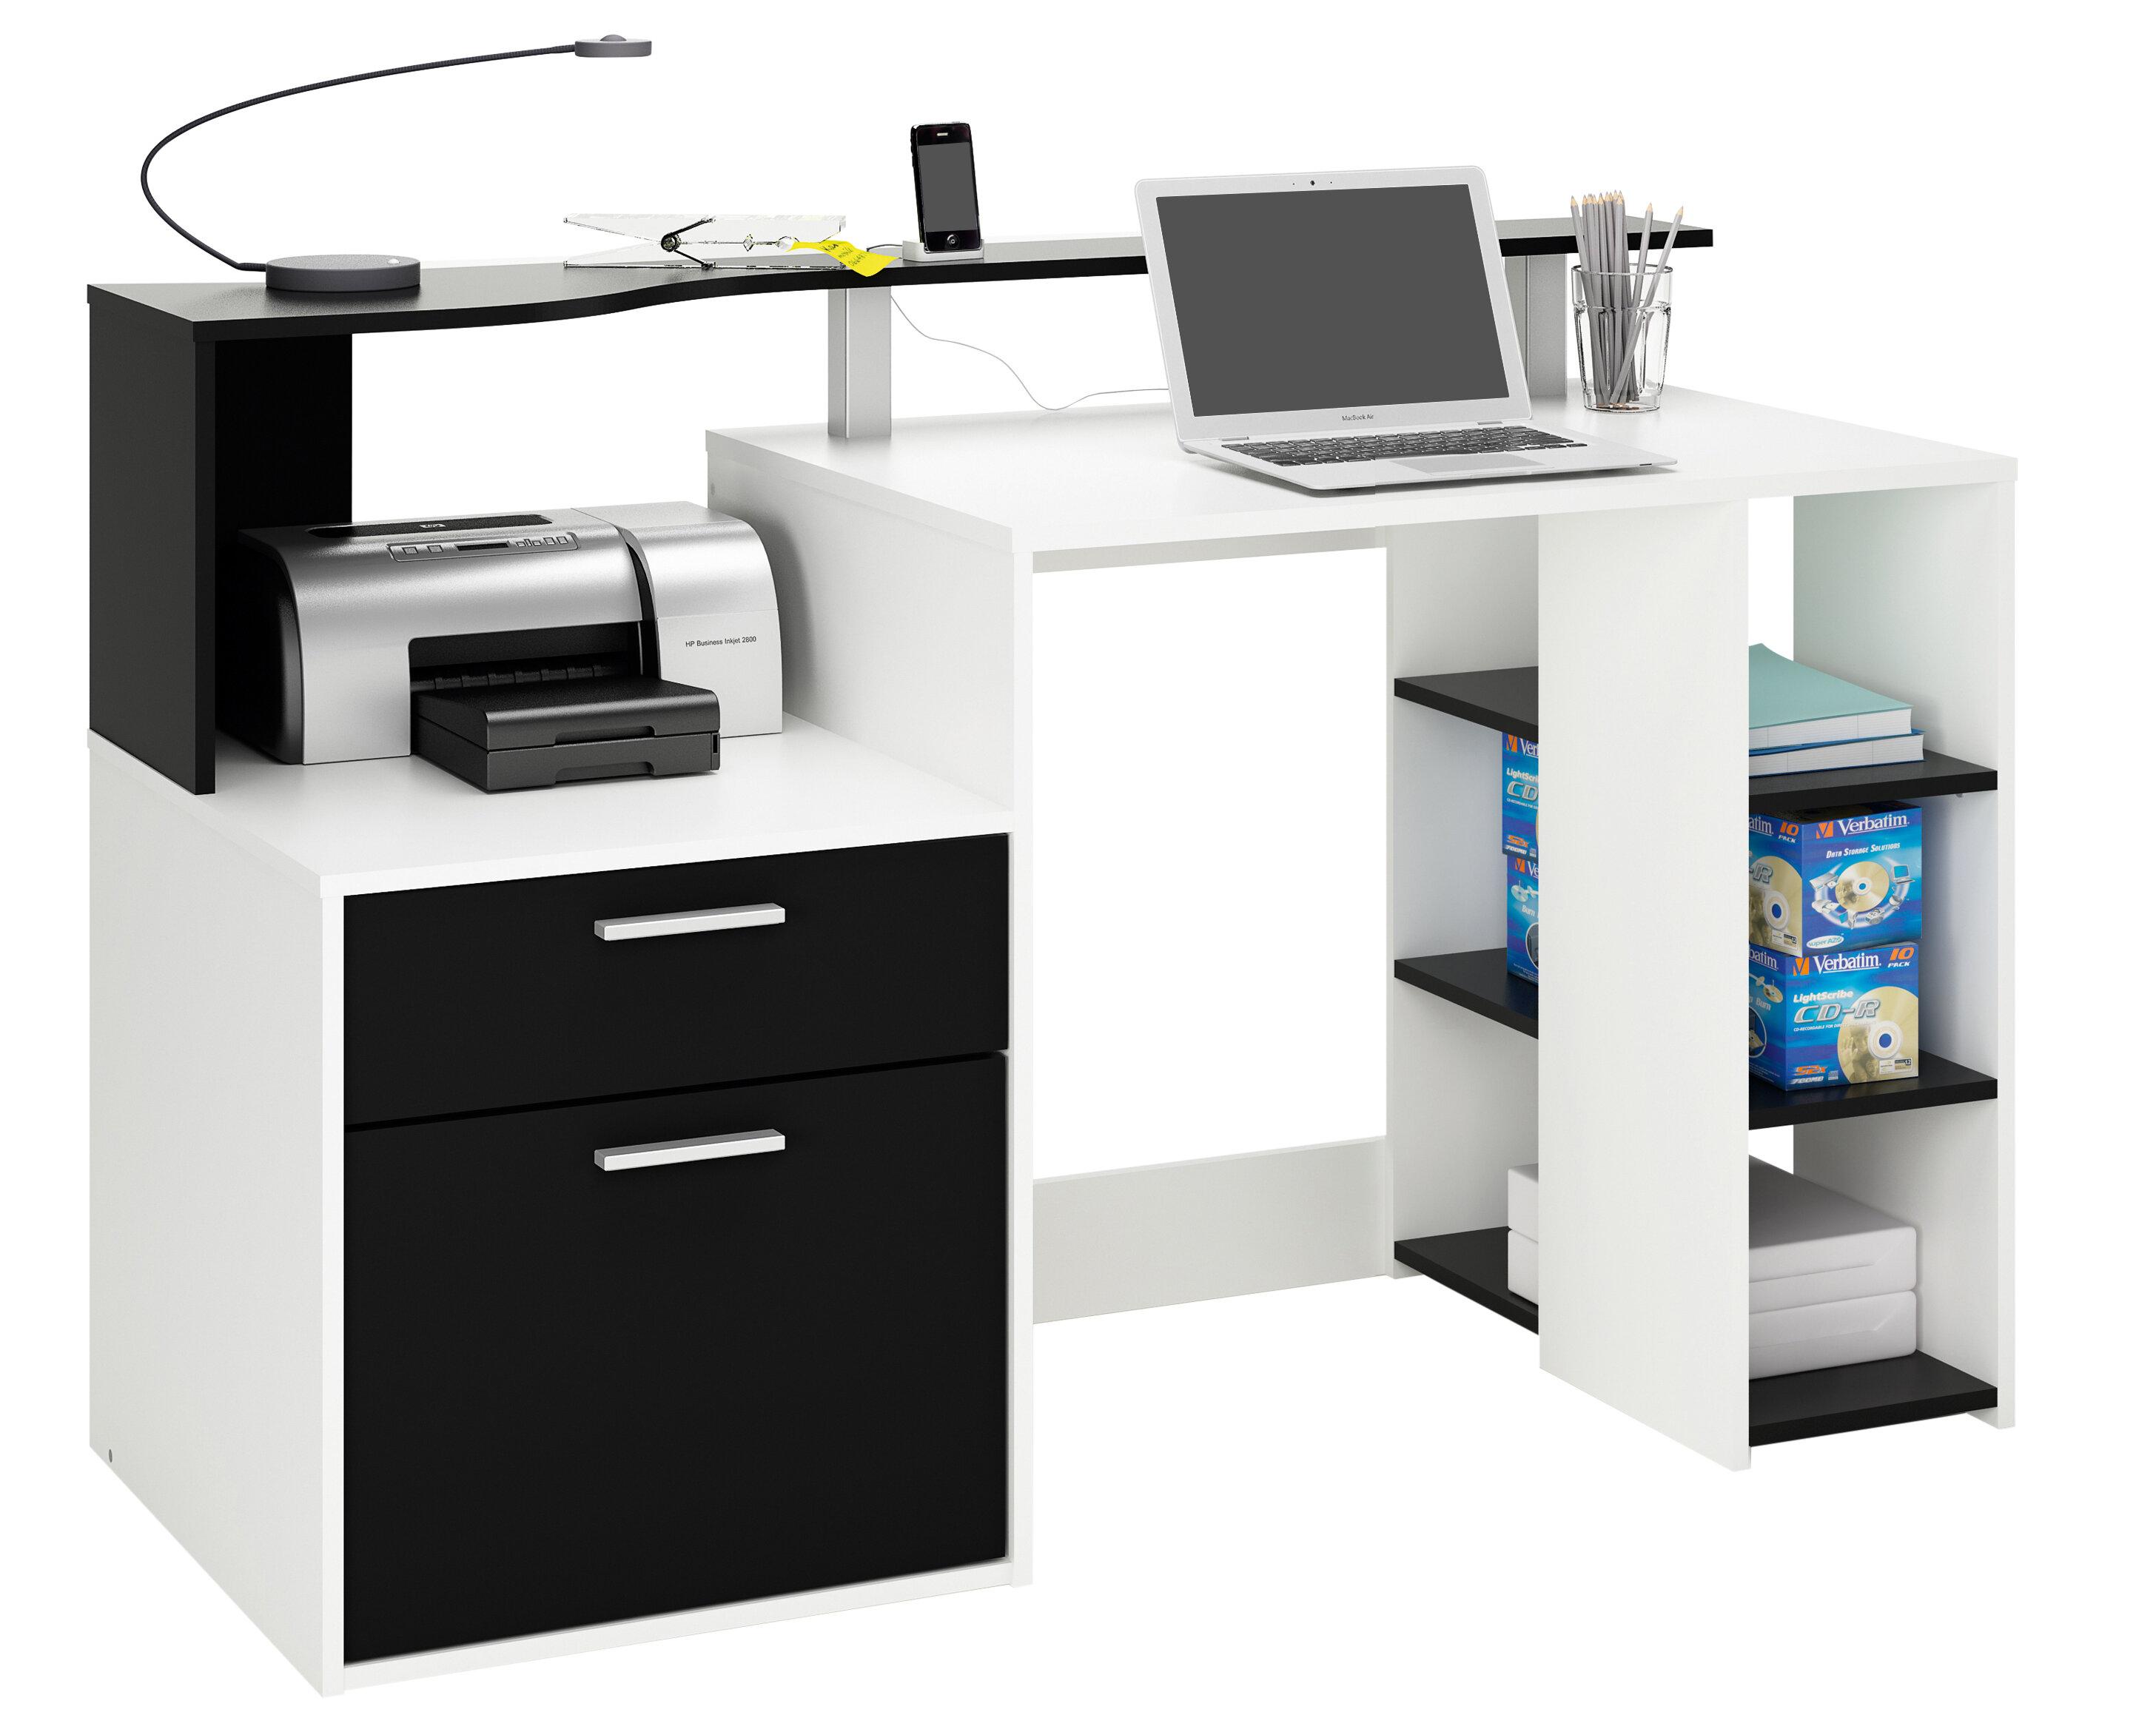 Home Etc Schreibtisch Mont U0026 Bewertungen | Wayfair.de